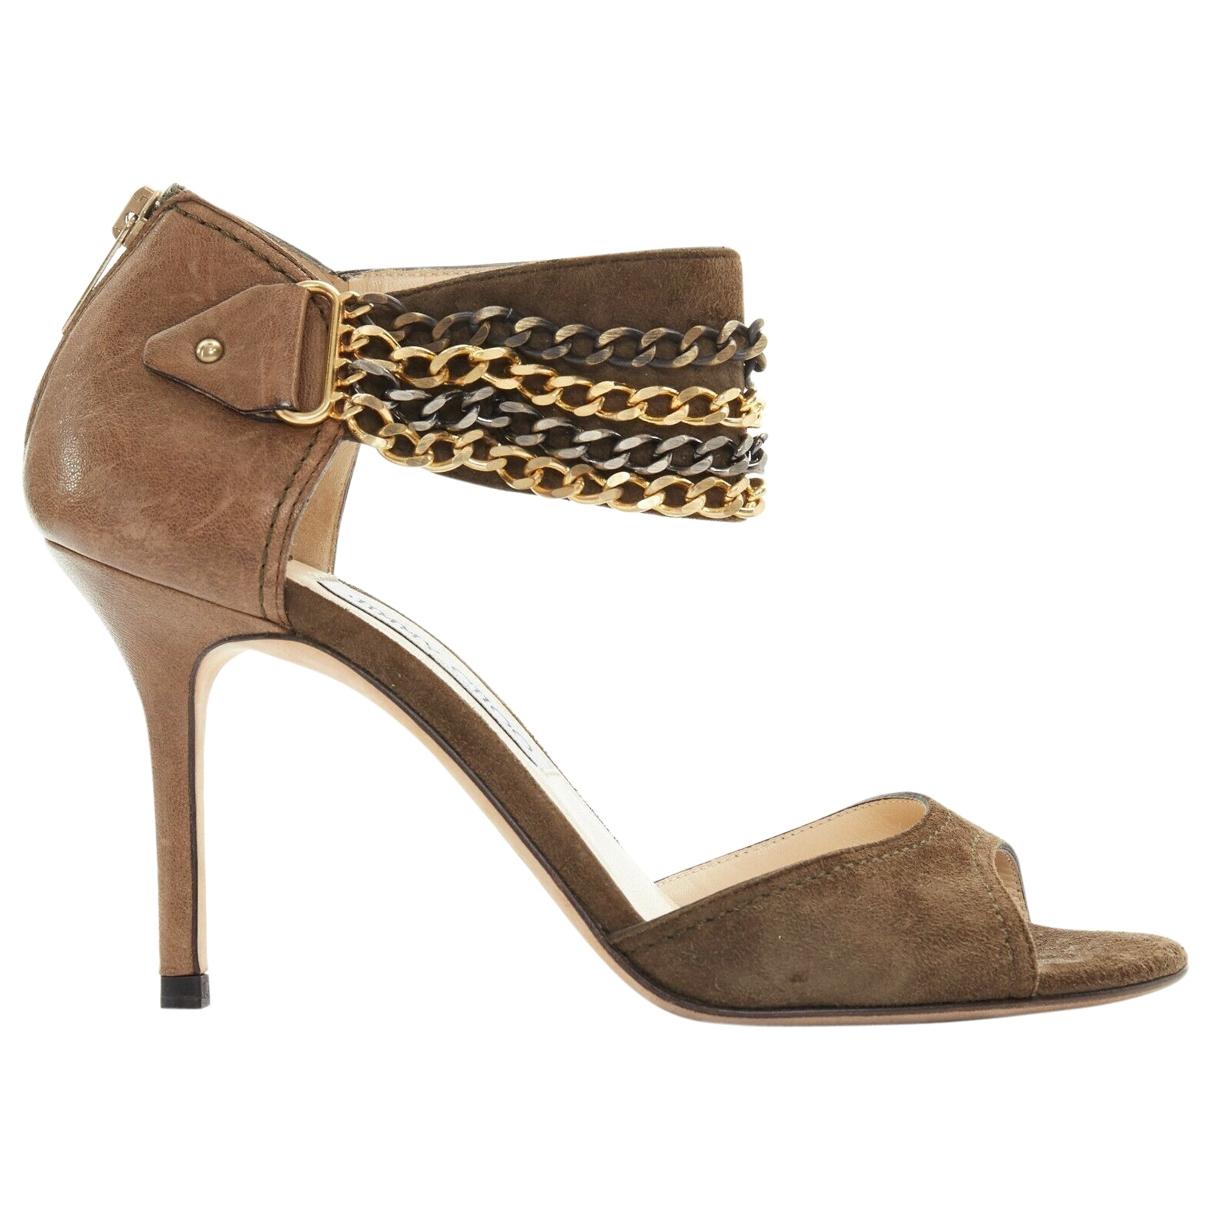 Jimmy Choo \N Green Suede Sandals for Women 37.5 EU